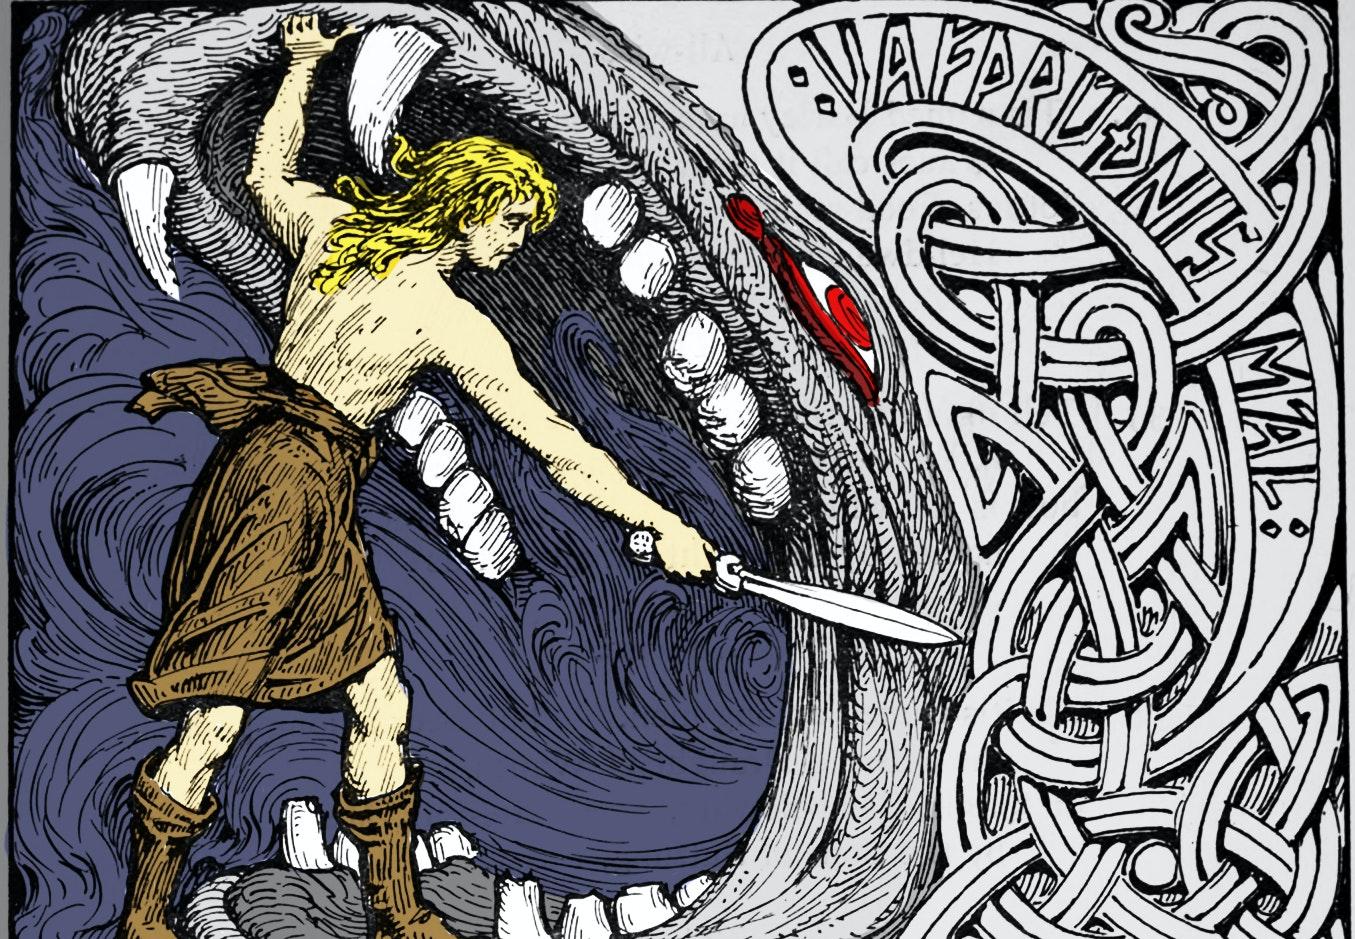 vikinge spyd